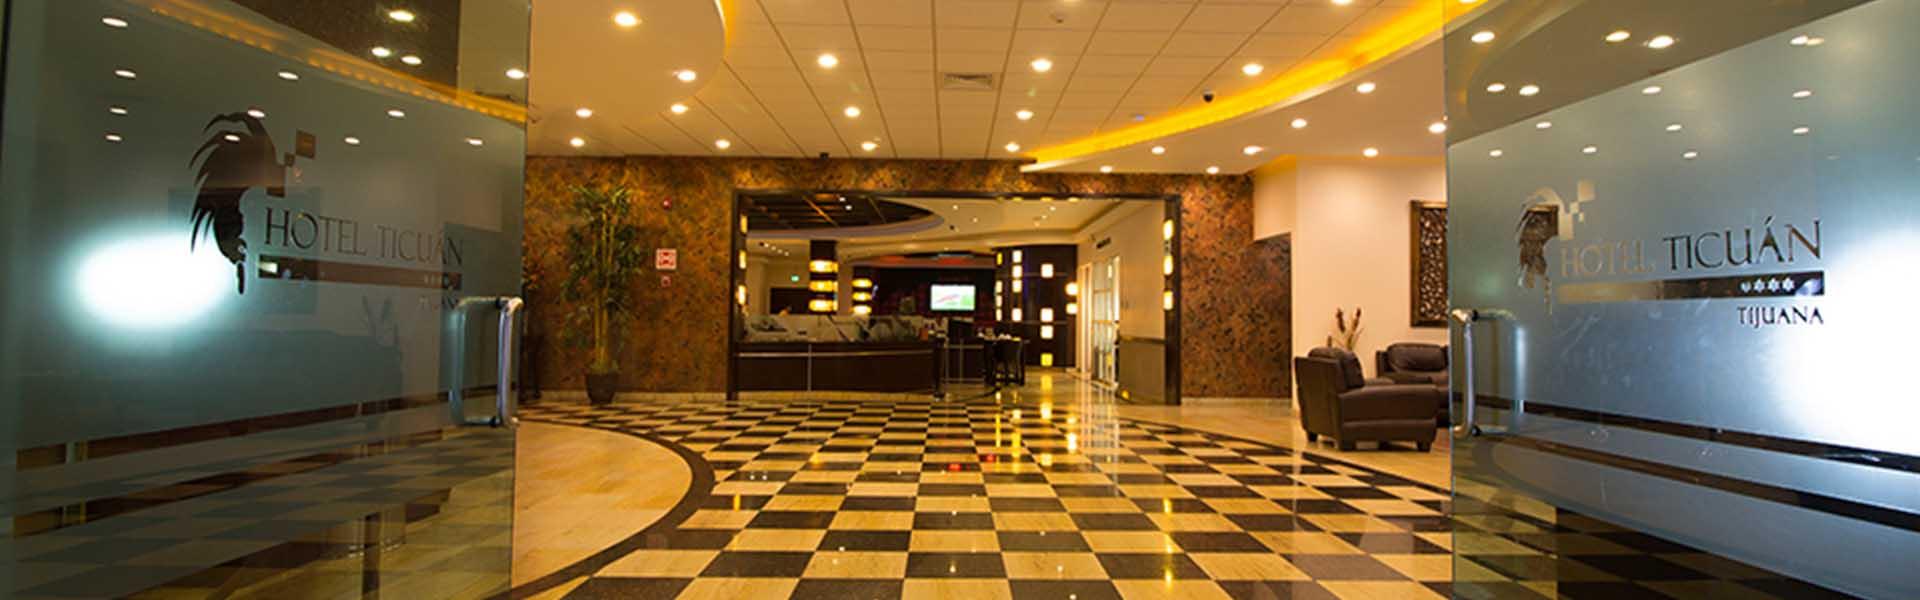 hotel-ticuan-tijuana